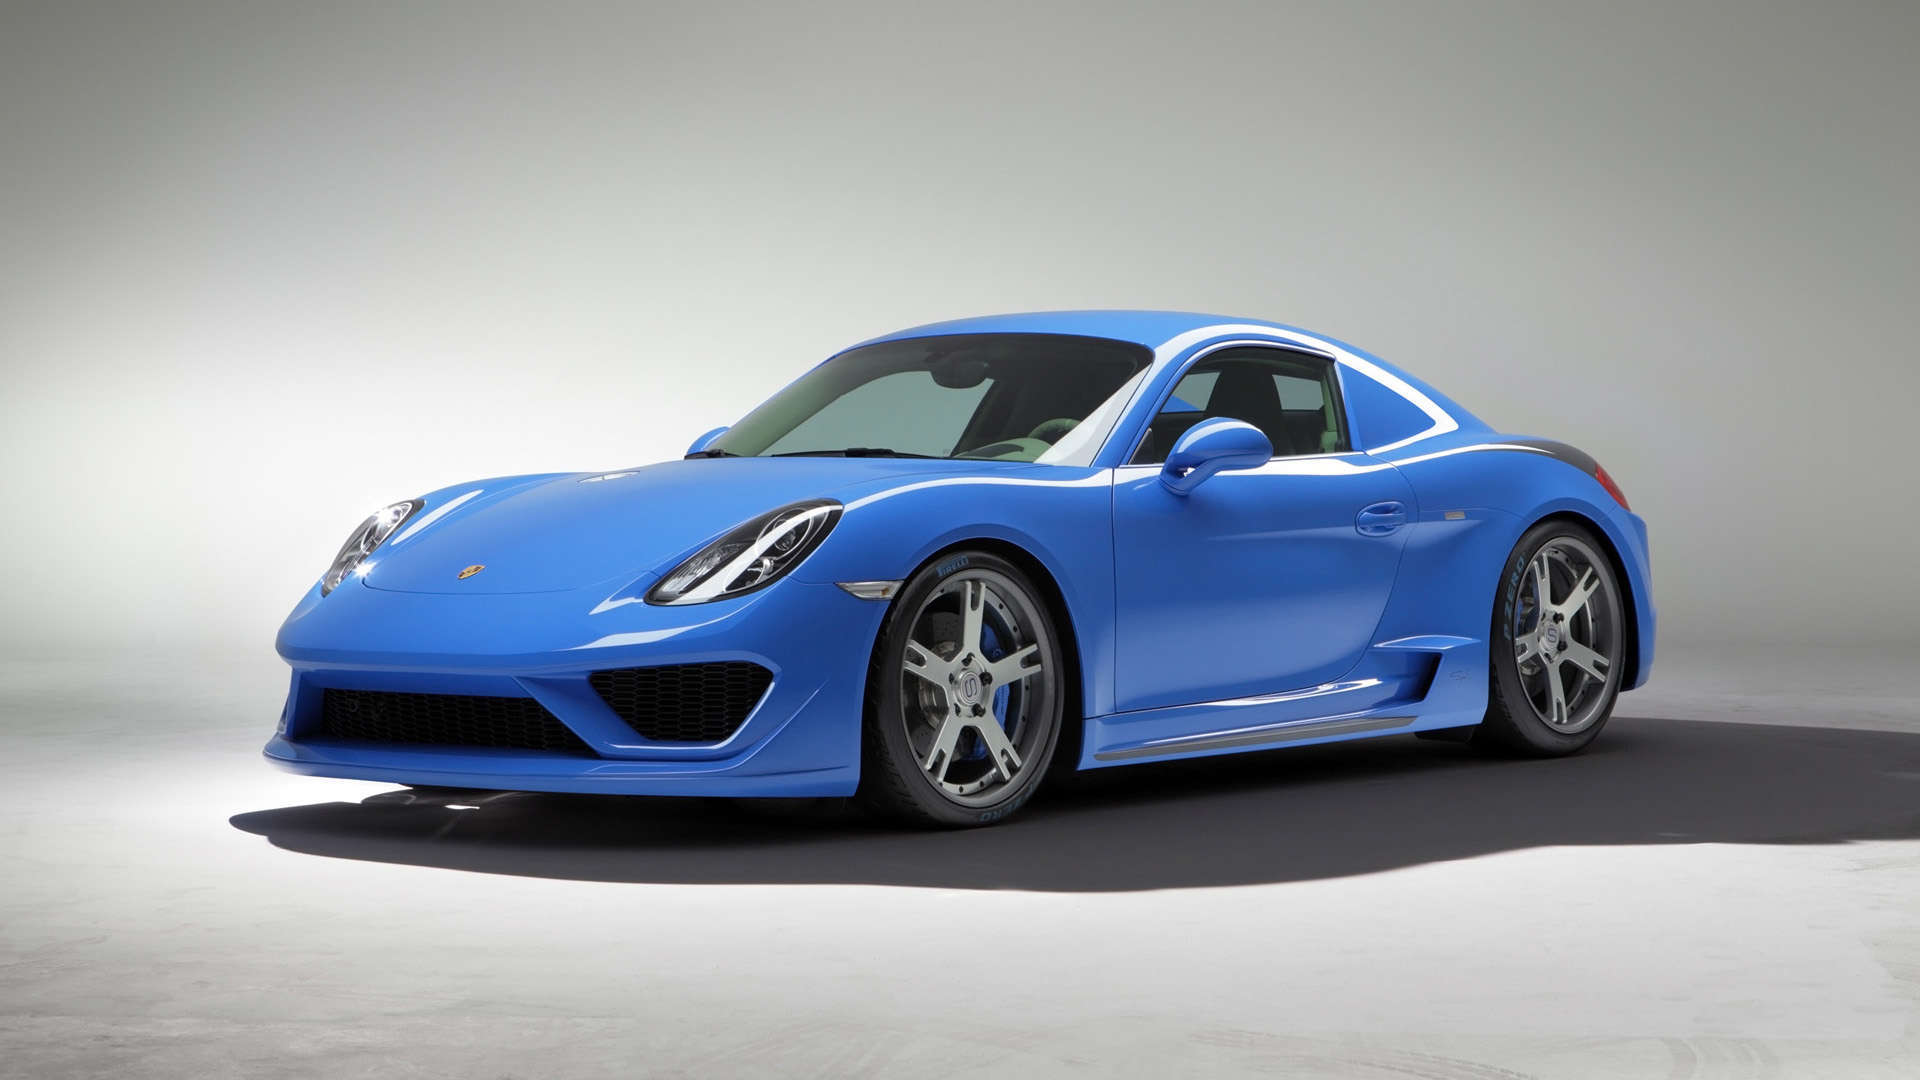 2014 Studiotorino Porsche Cayman Moncenisio HD Wallpaper 1080p 1920x1080